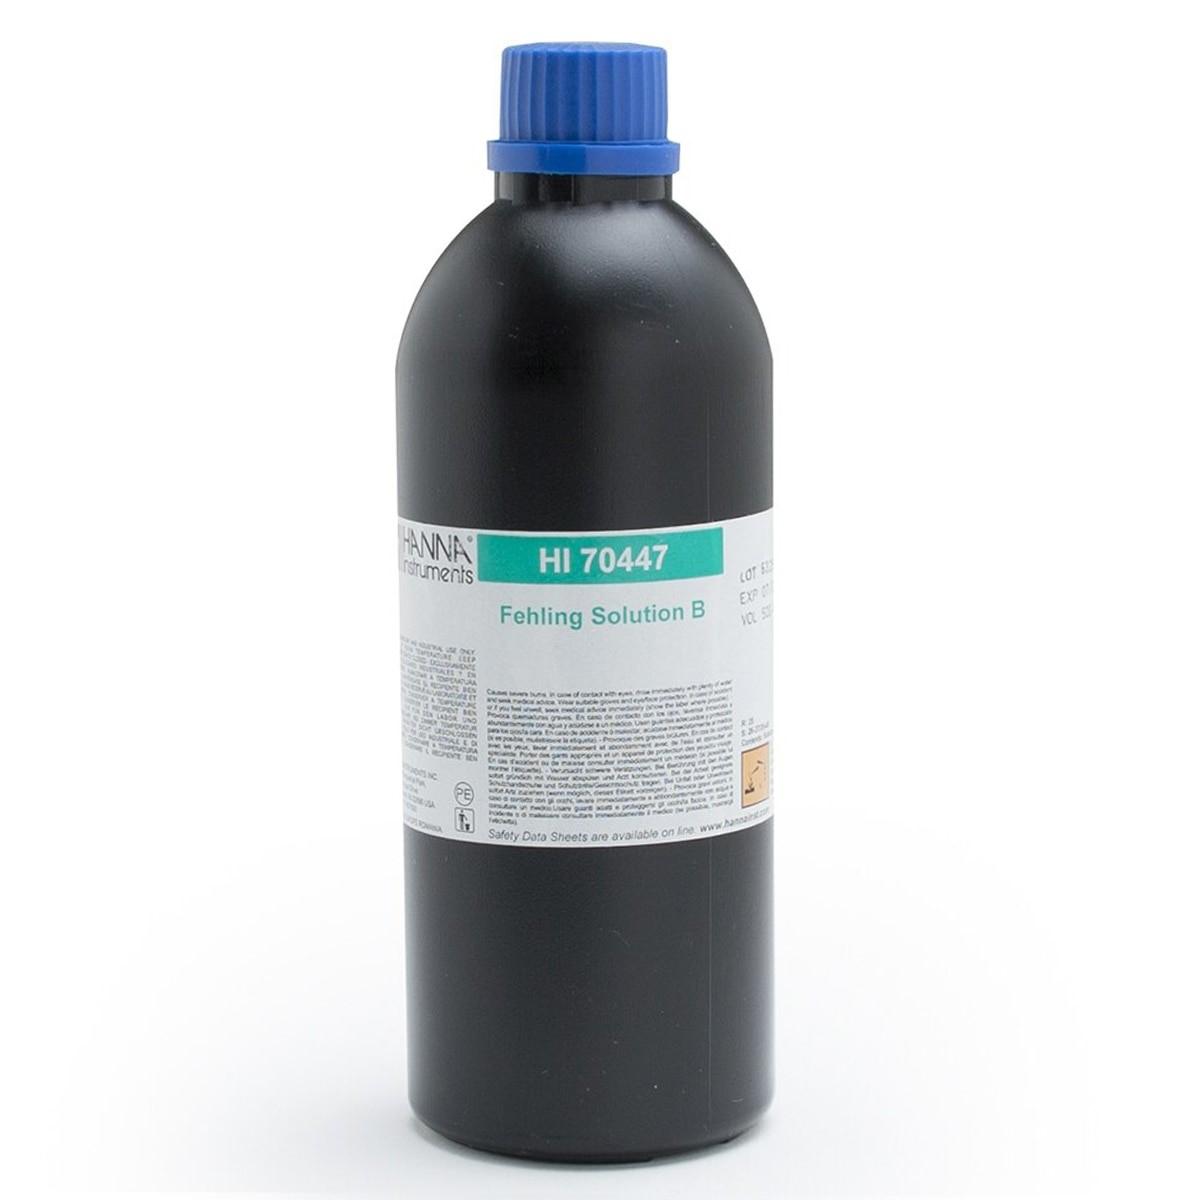 Fehling Solution B, 500 mL - HI70447